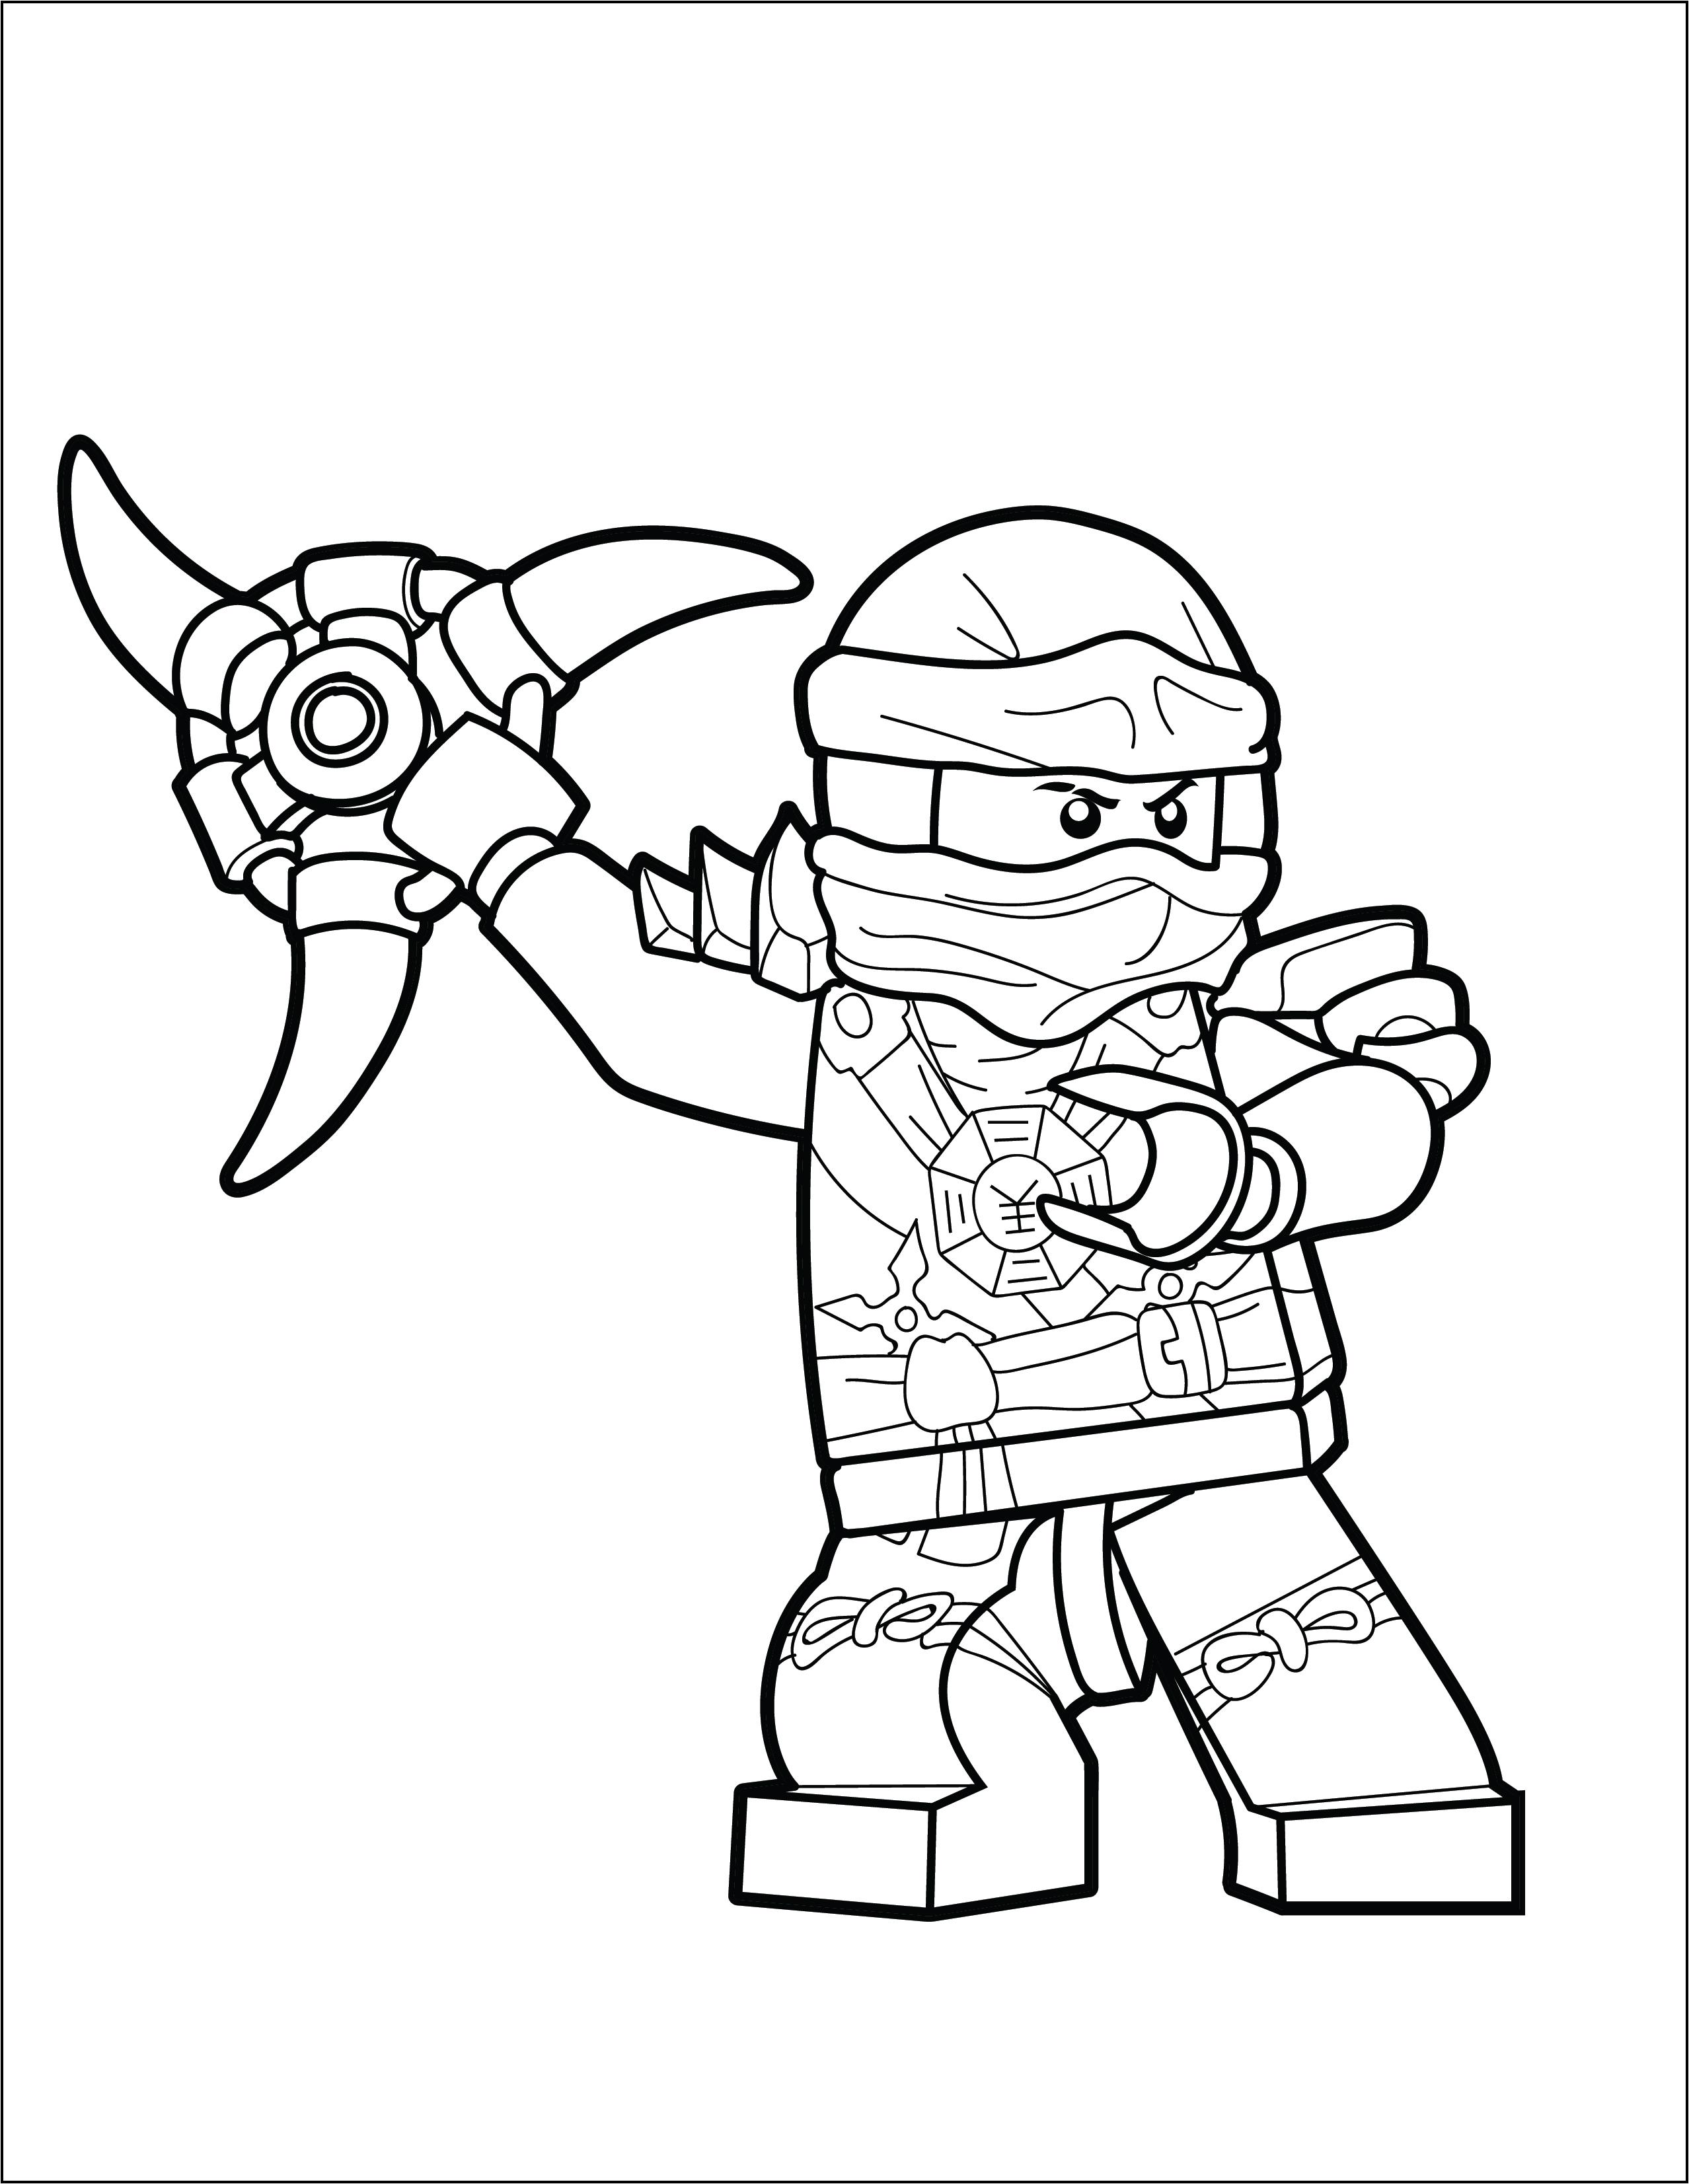 ninjago color point brick colorin pages lego ninjago titanium zane color ninjago